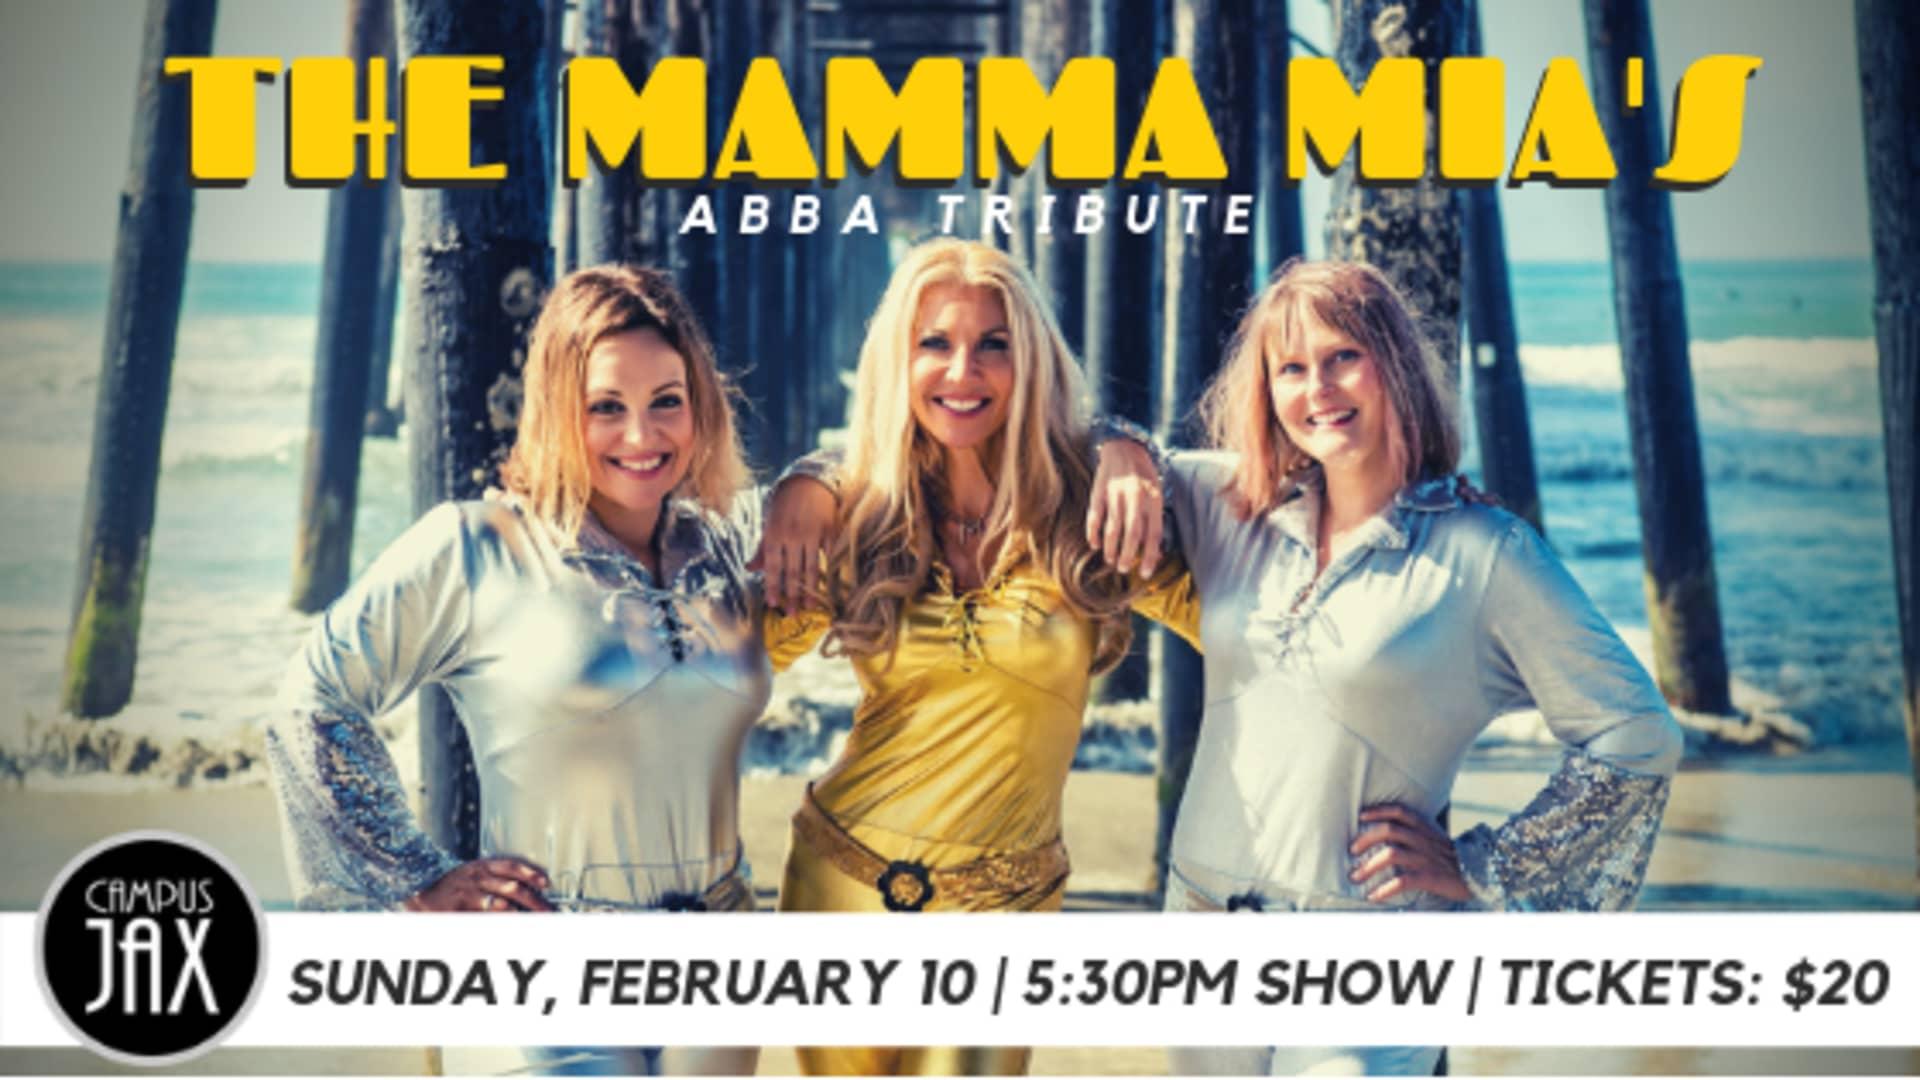 February 10 | THE MAMMA MIA'S